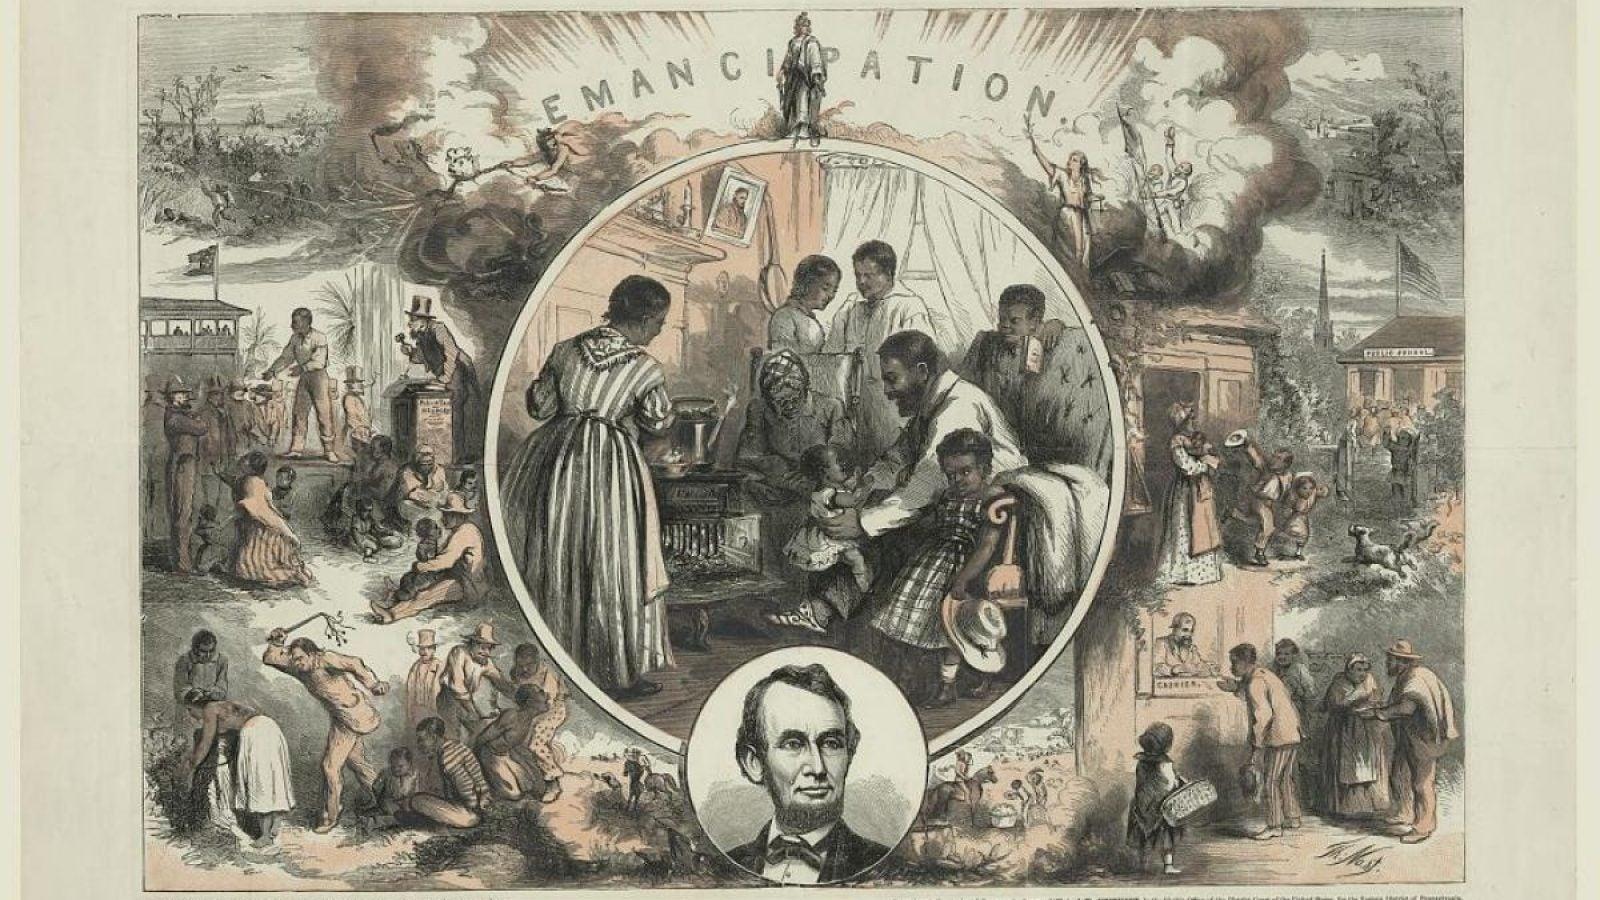 A vintage print of Civil War scenes and formerly enslaved people